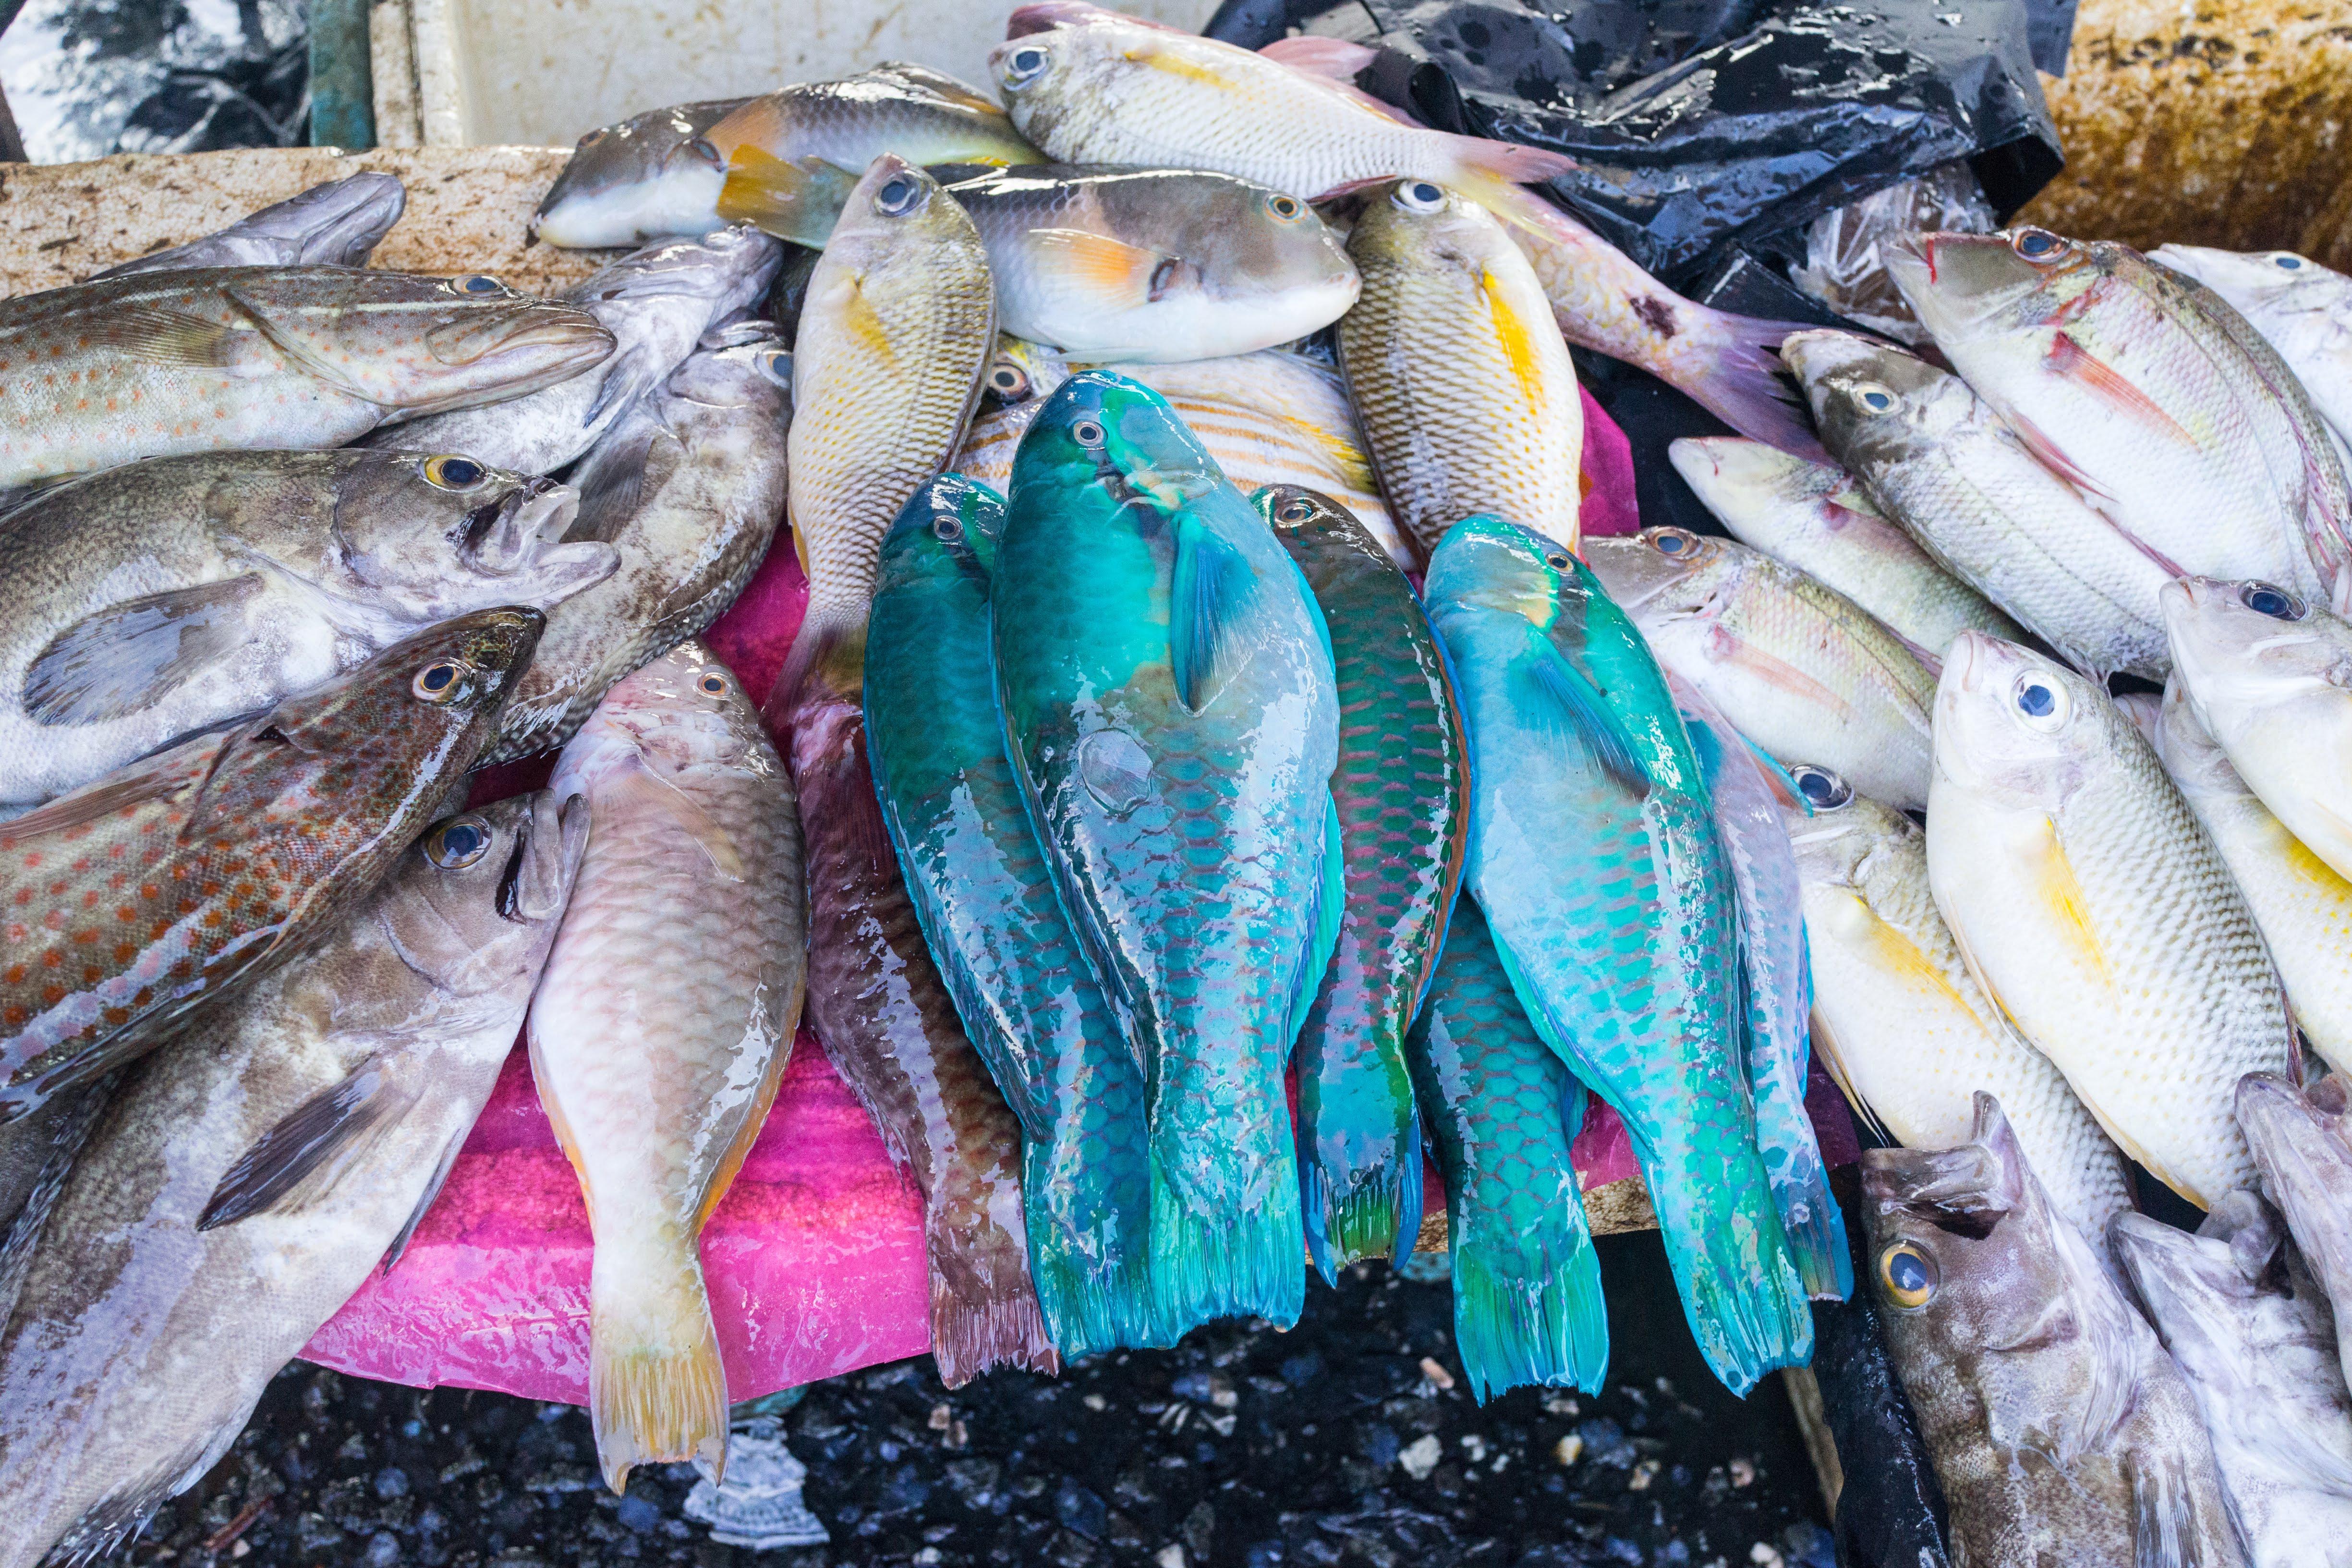 Semporna Fish Market